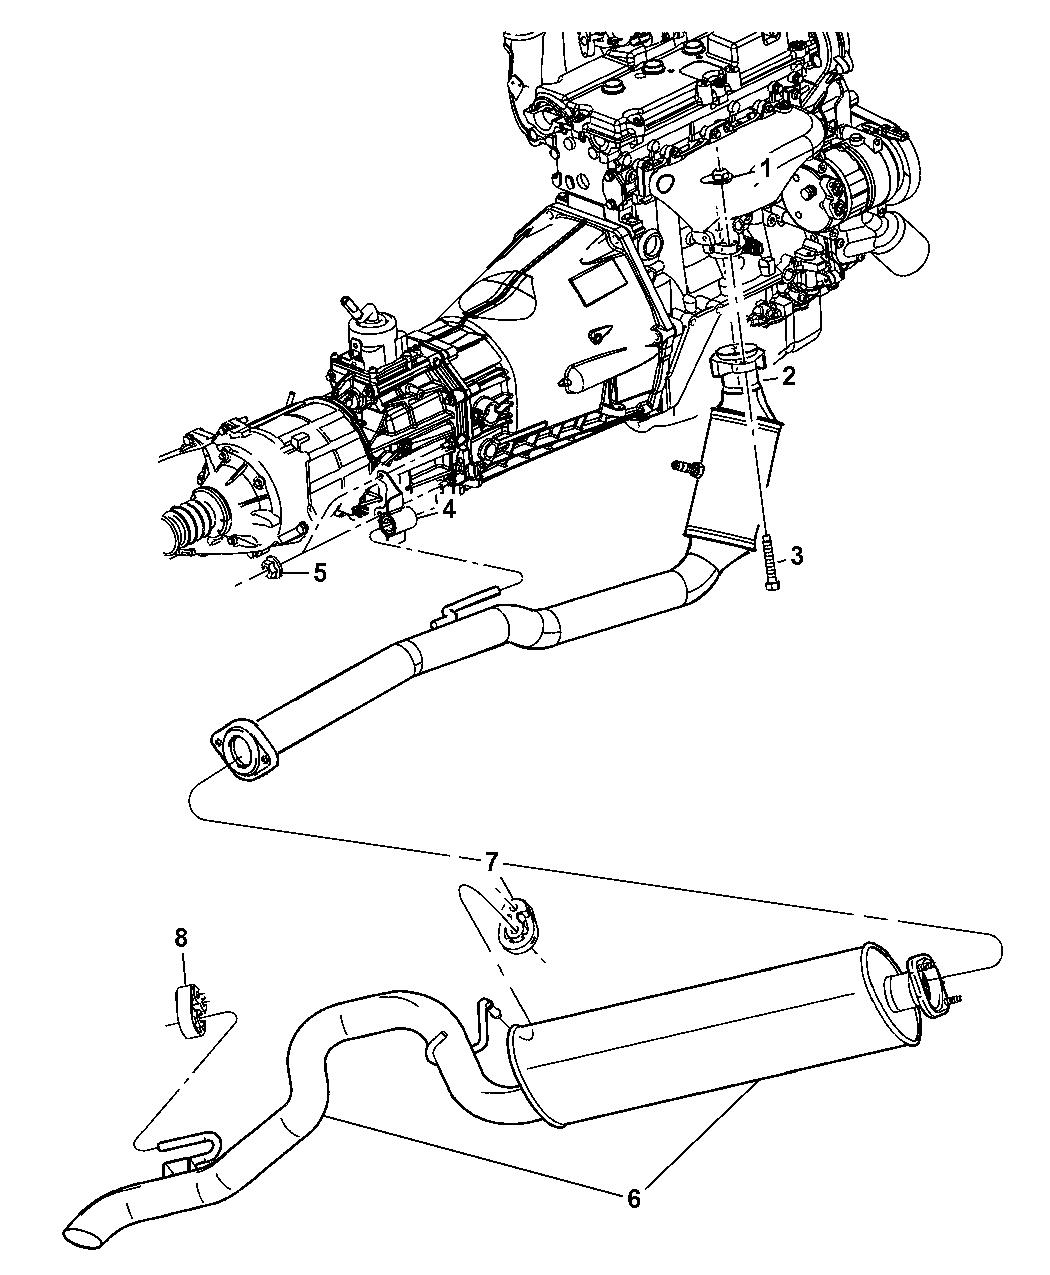 2005 Jeep Liberty Exhaust System Mopar Parts Giant Diagram Thumbnail 2